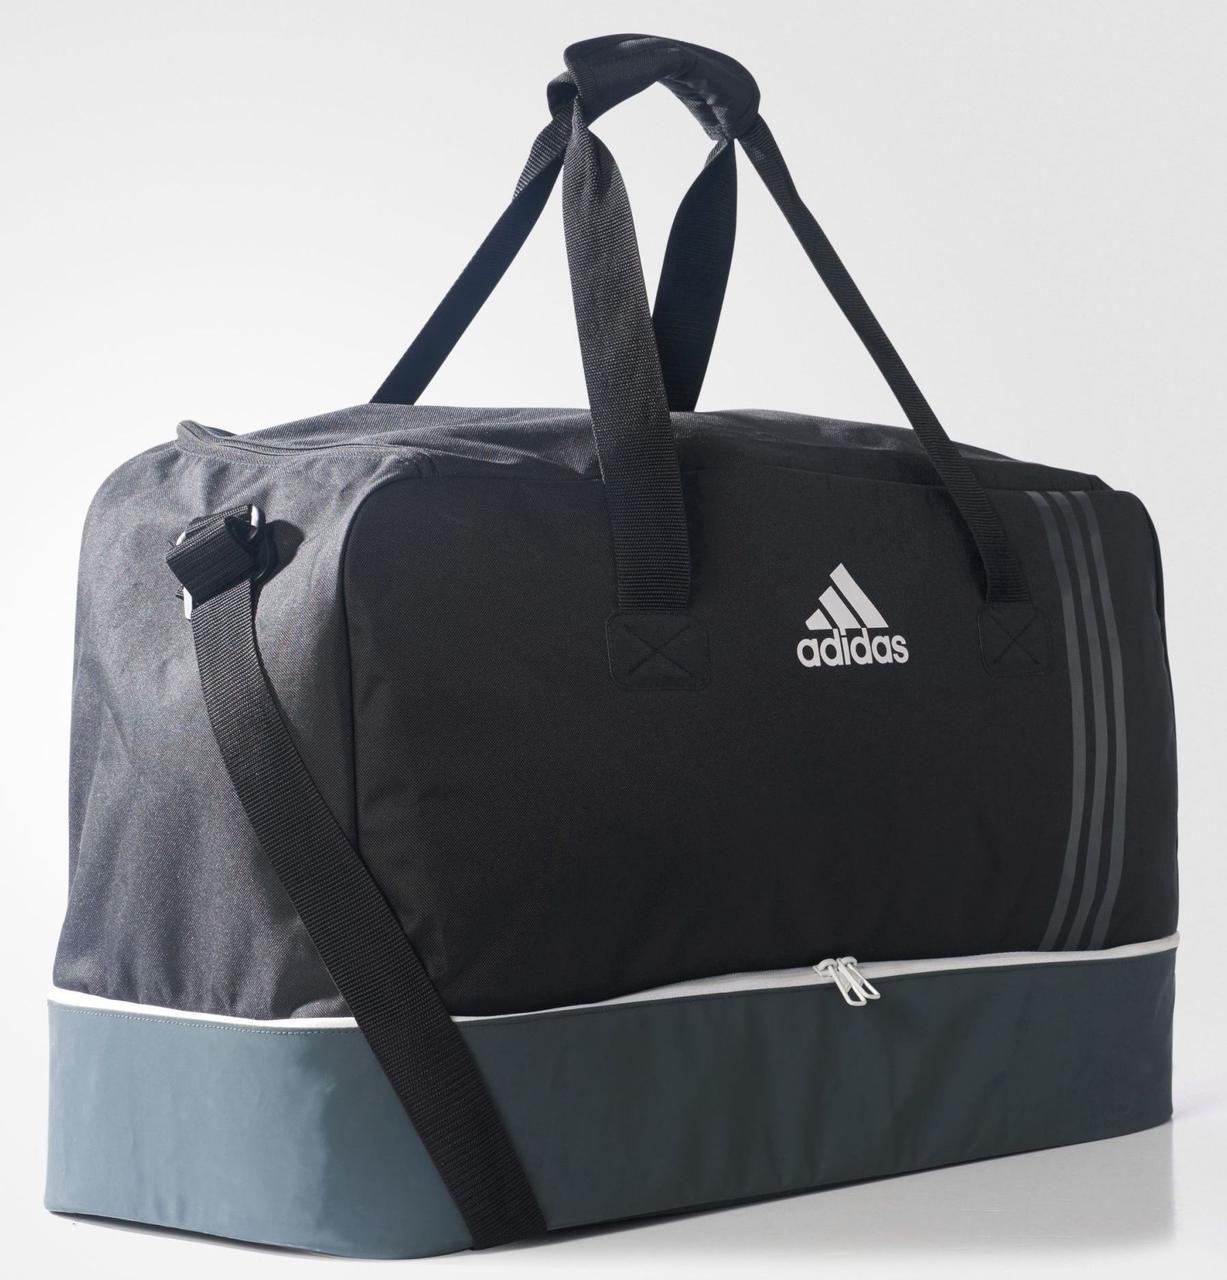 5794d9b8 Спортивная сумка ADIDAS Tiro Team Bag Large B46122, черный/серый ...